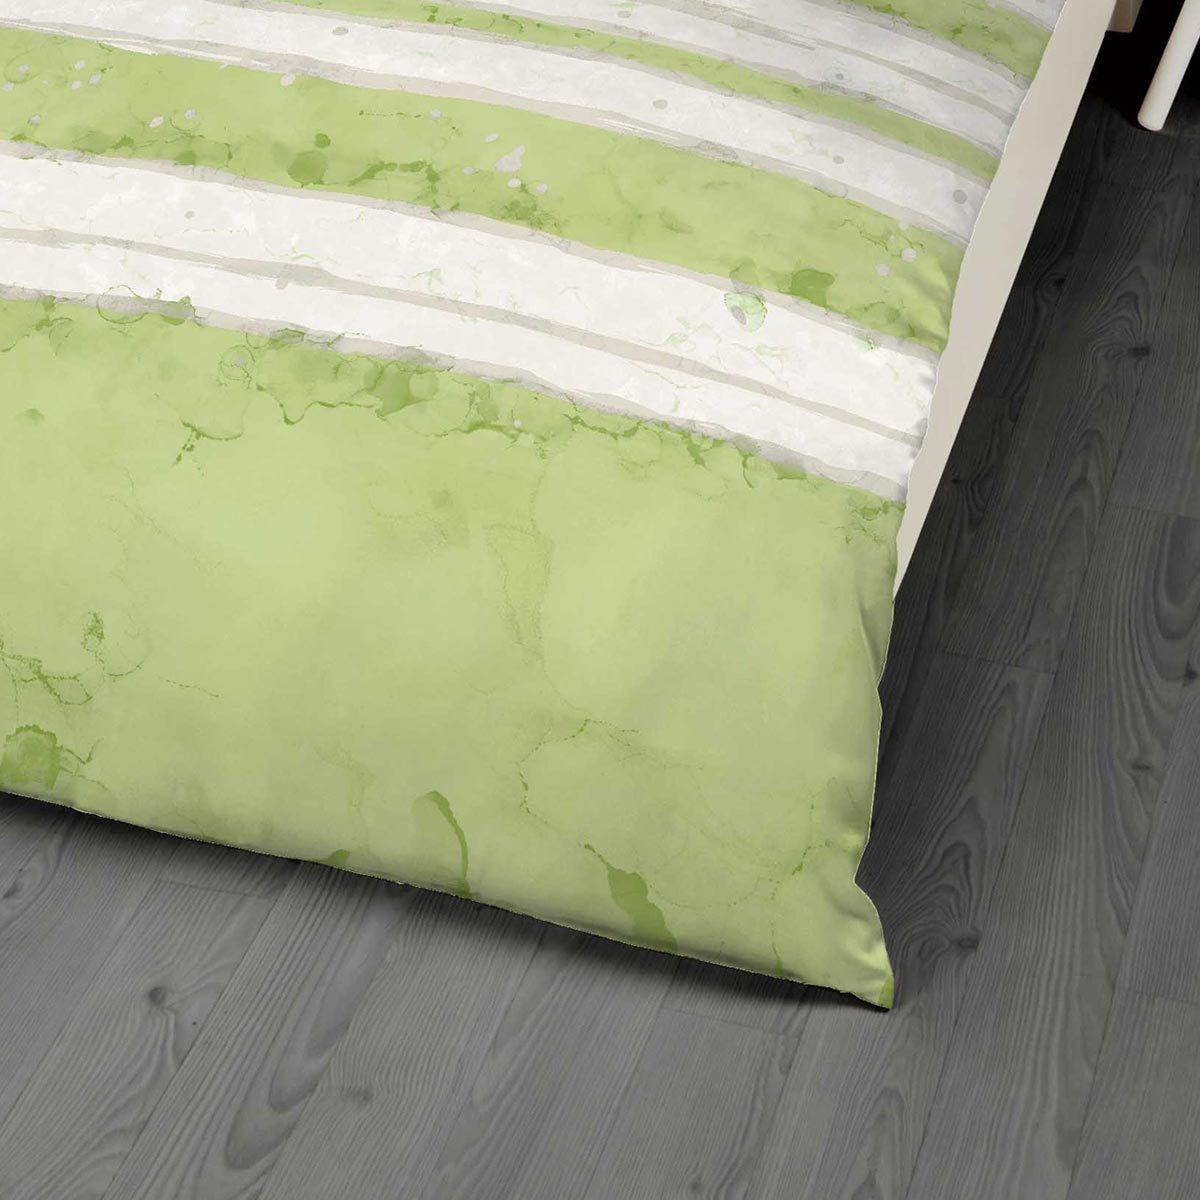 kaeppel mako satin bettw sche aquarello gr n g nstig online kaufen bei bettwaren shop. Black Bedroom Furniture Sets. Home Design Ideas